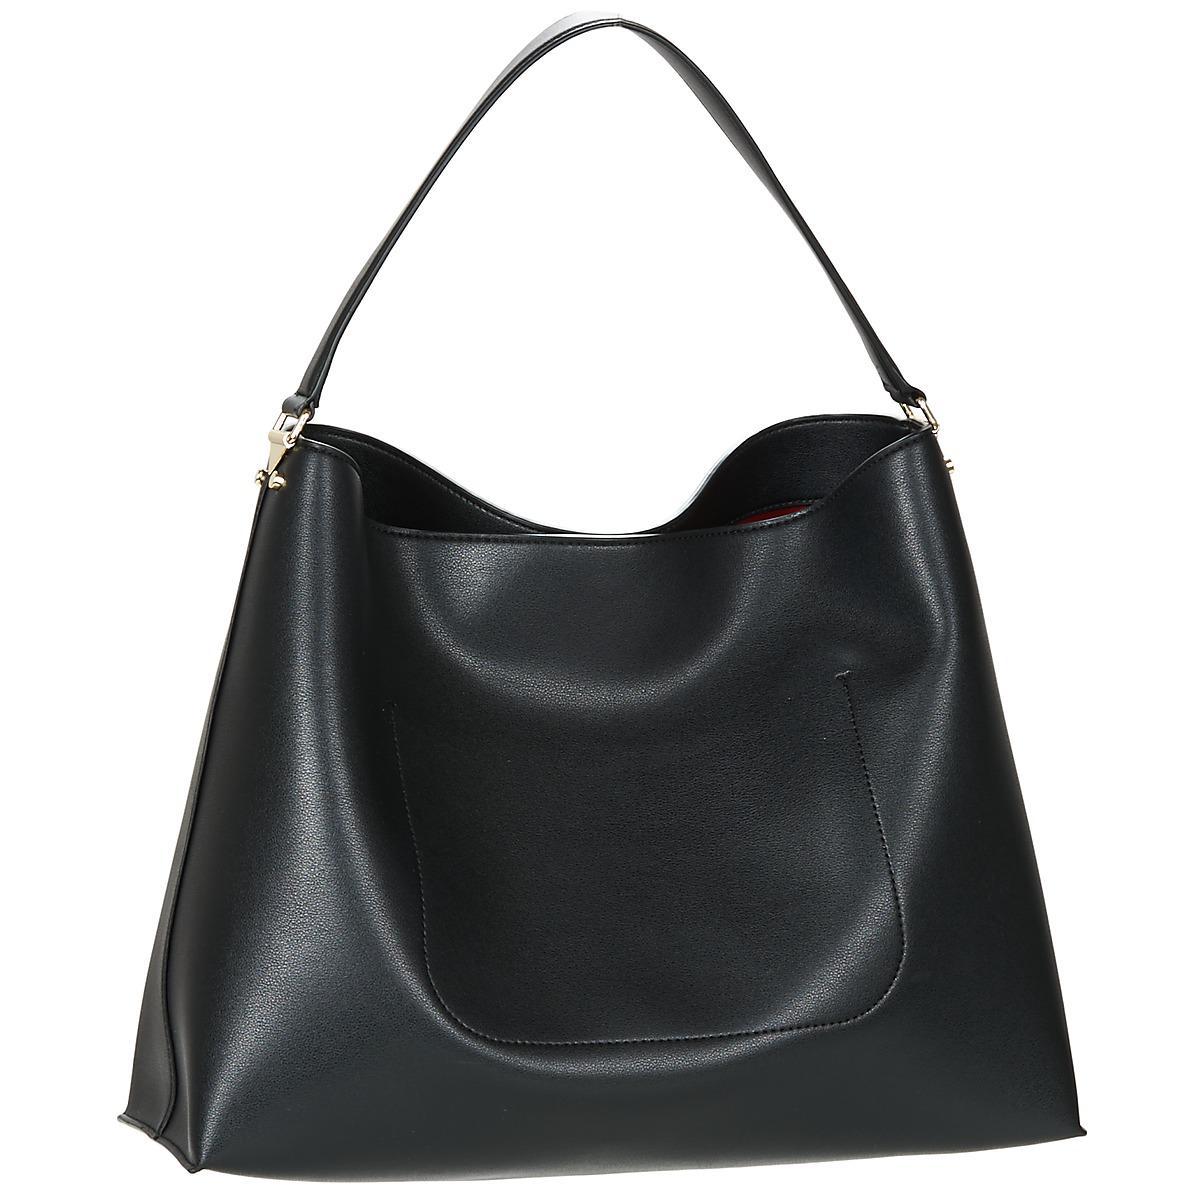 Emporio Armani - Nellie Hobo Women s Shoulder Bag In Black for Men - Lyst.  View fullscreen 5d05a4b9b5425